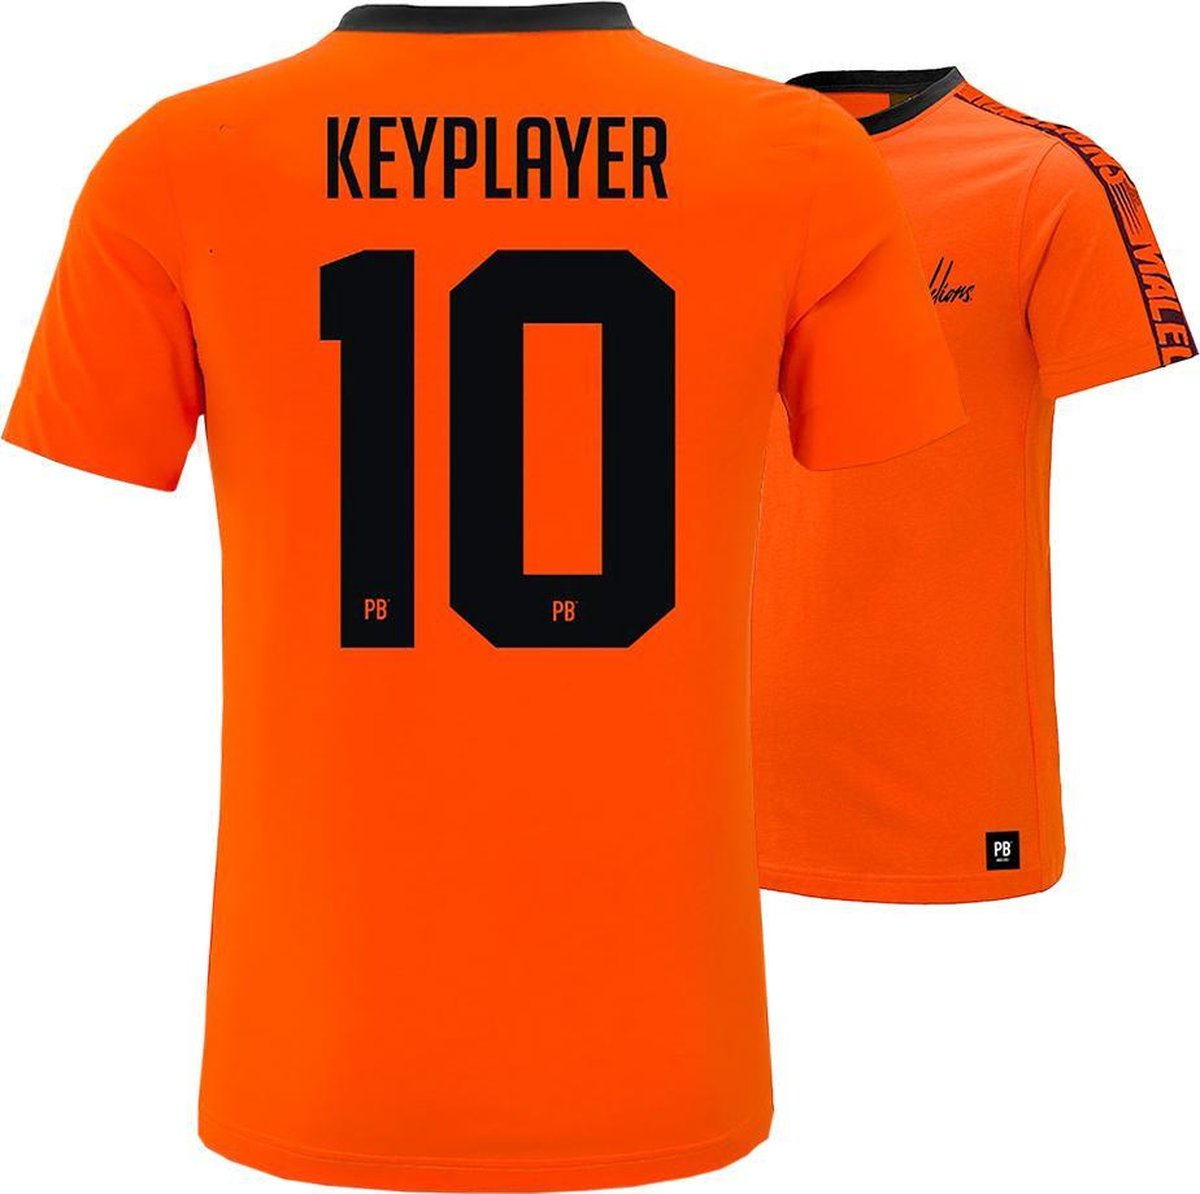 PB x Malelions - 10. Keyplayer   Maat XXL   Oranje T-shirt   EK voetbal 2021   Heren en dames